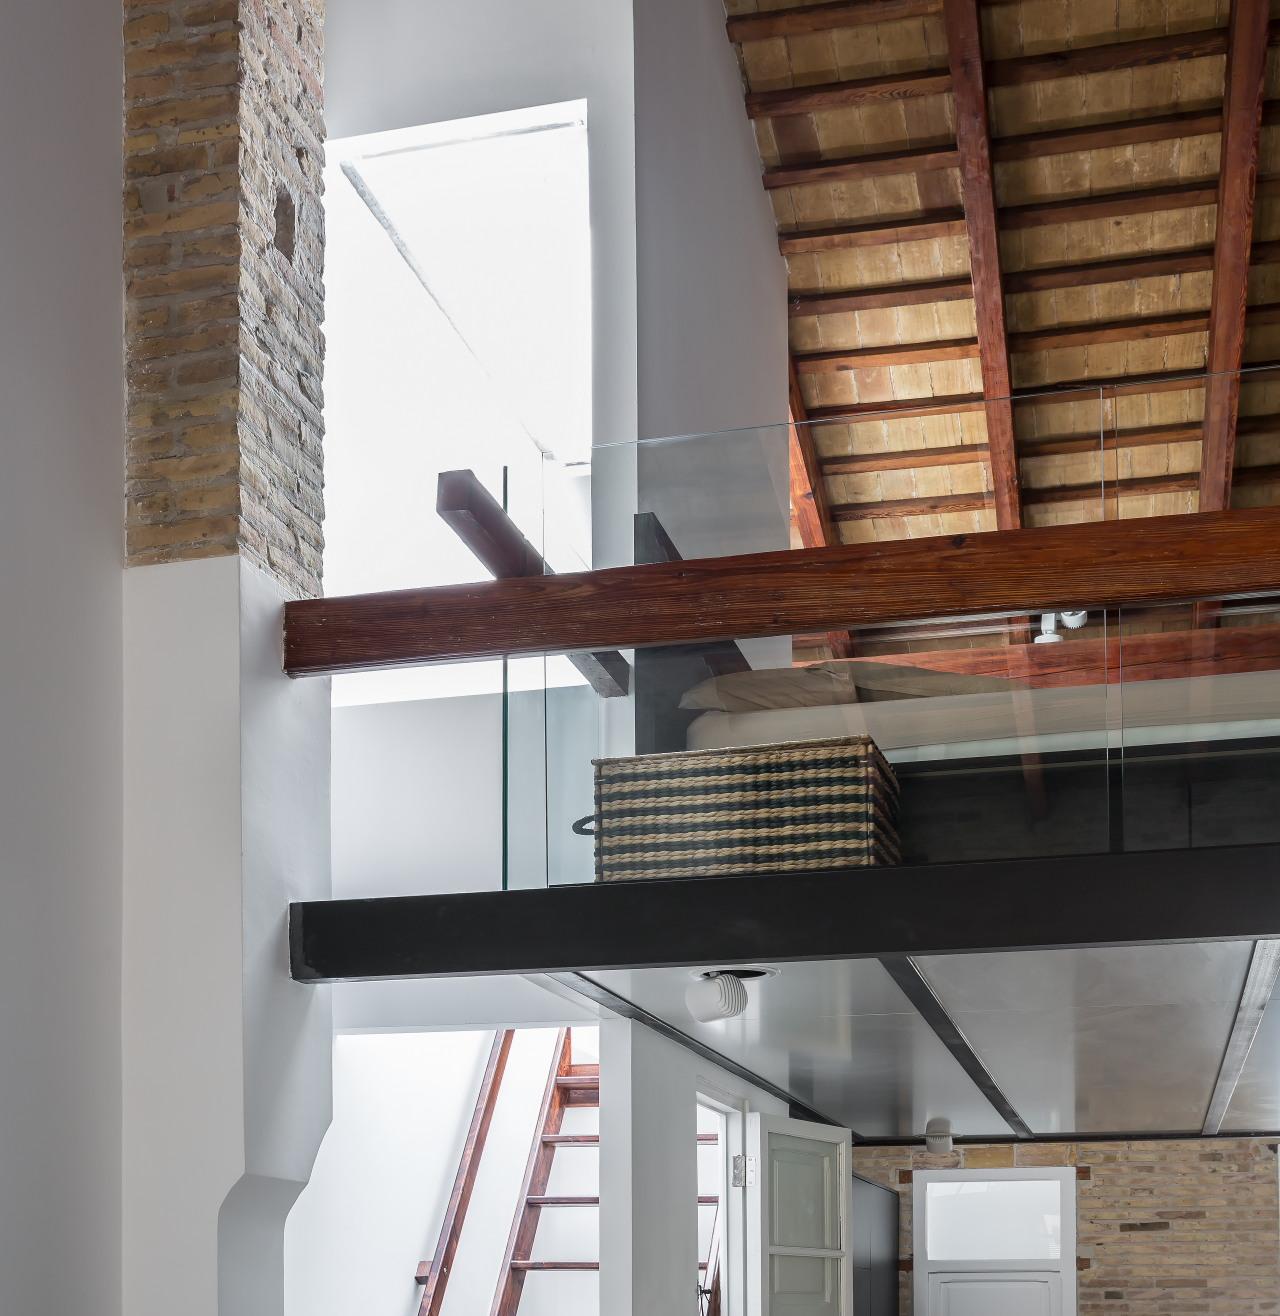 fotografia-arquitectura-valencia-german-cabo-ambau-cabanyal (18)